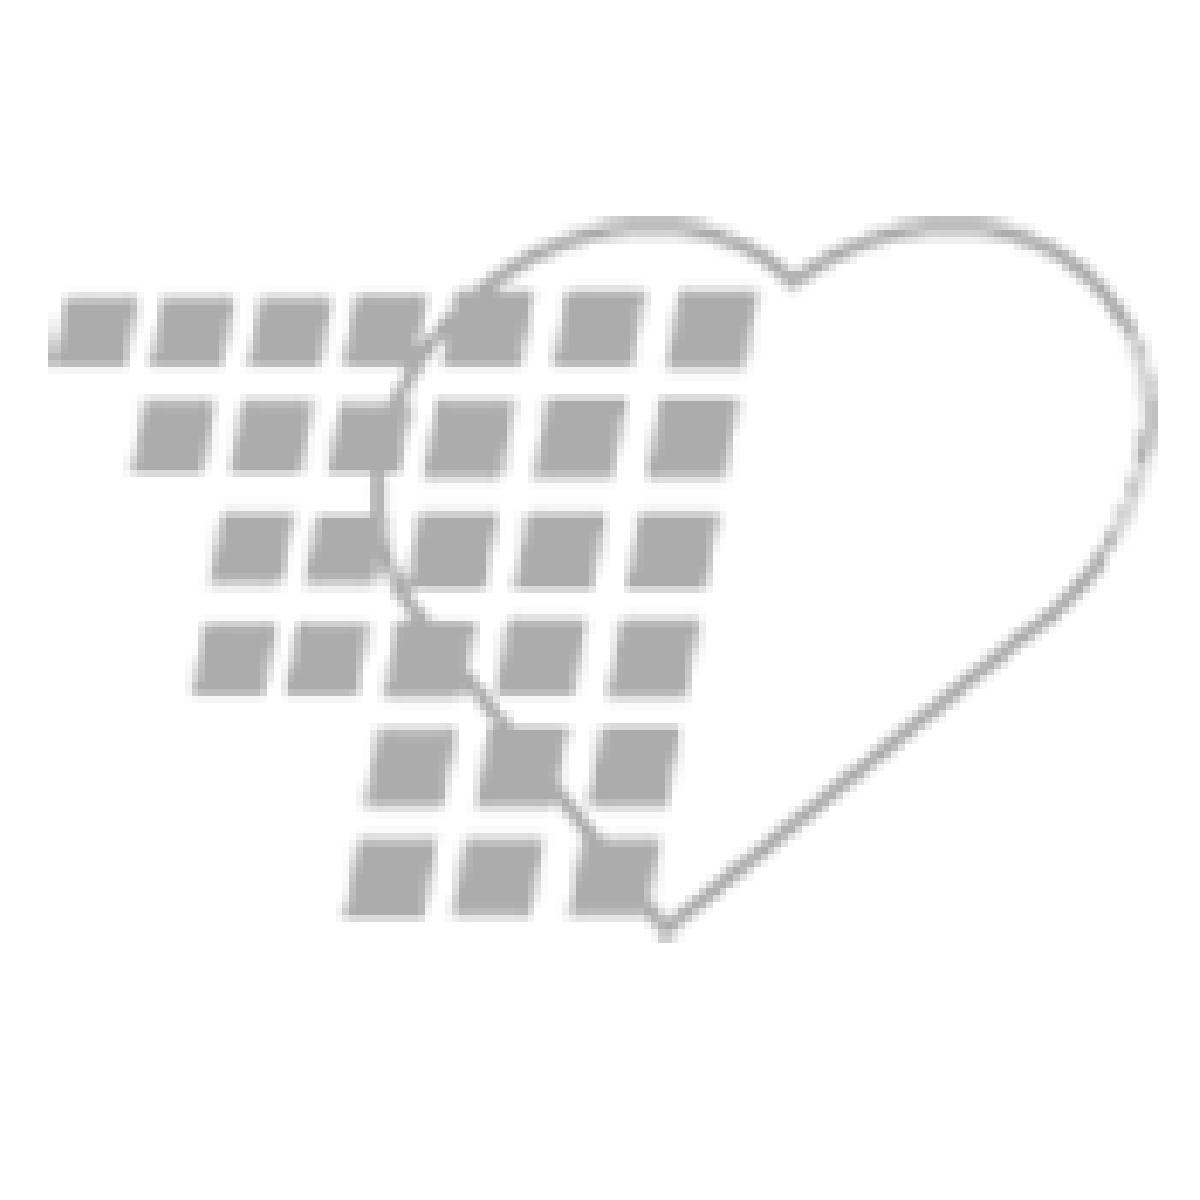 11-81-0933 Nasco Life/form® Elderly Pressure Ulcer Foot